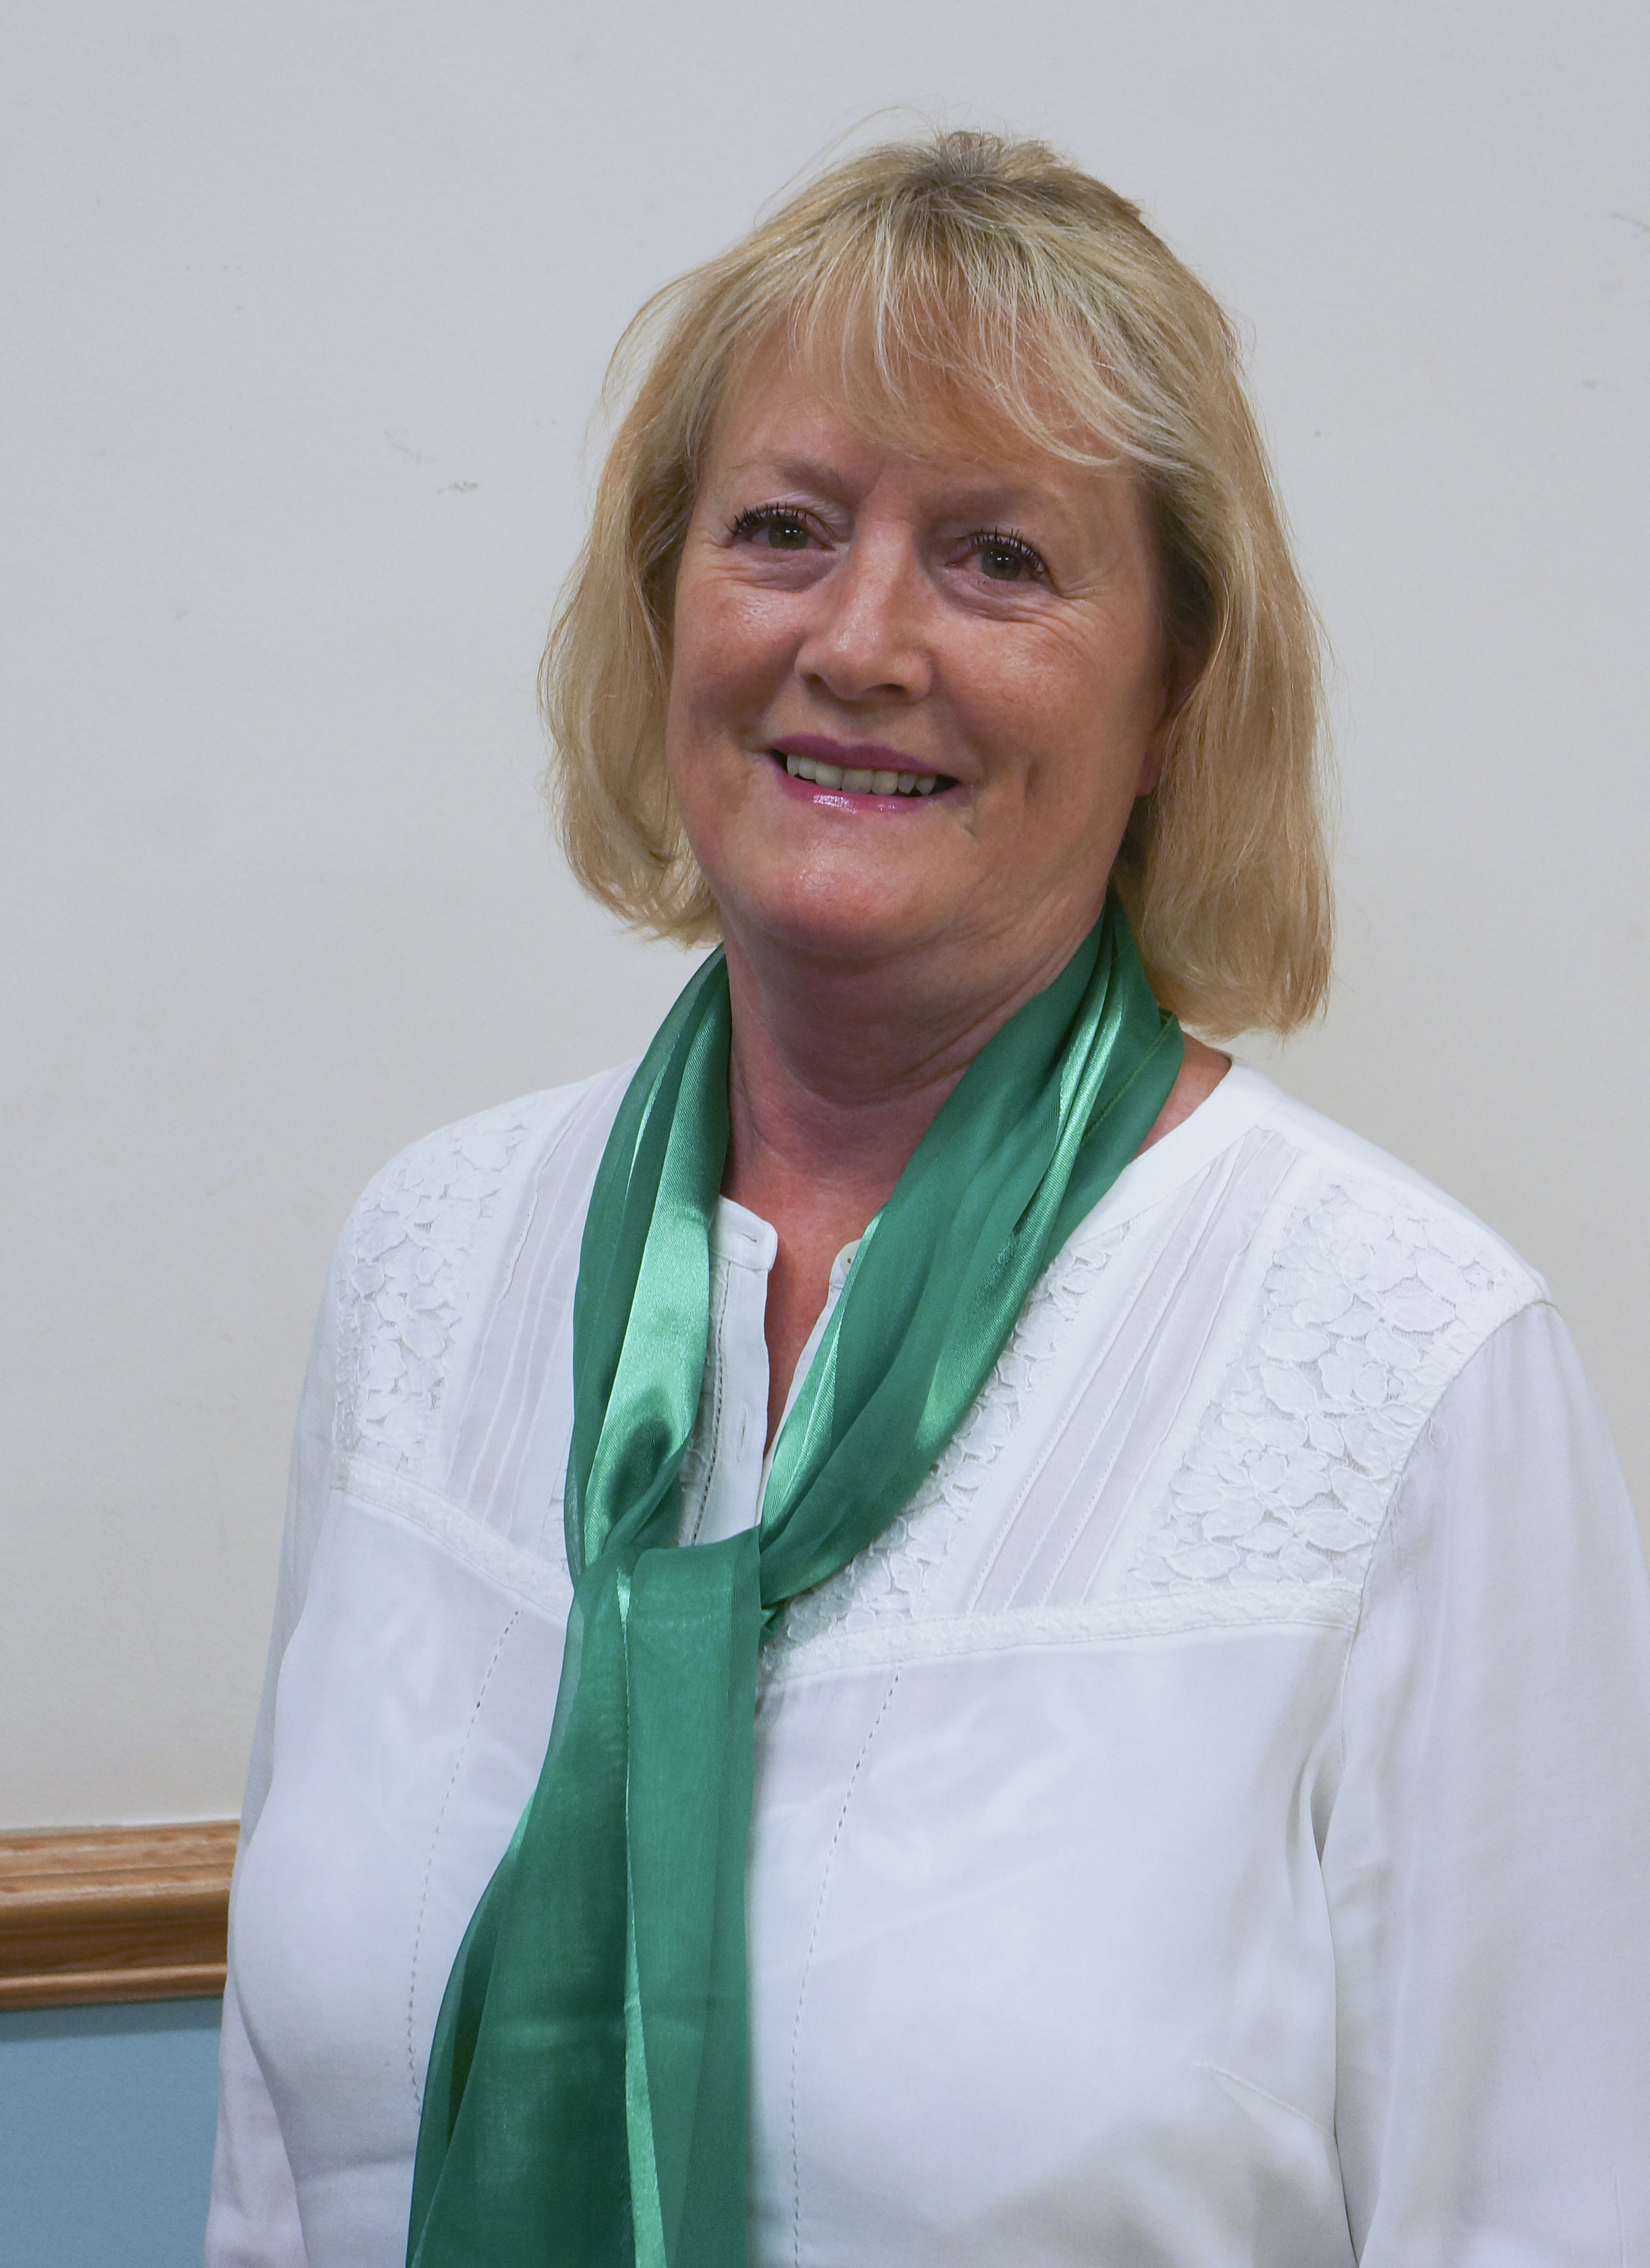 Kath Birchall